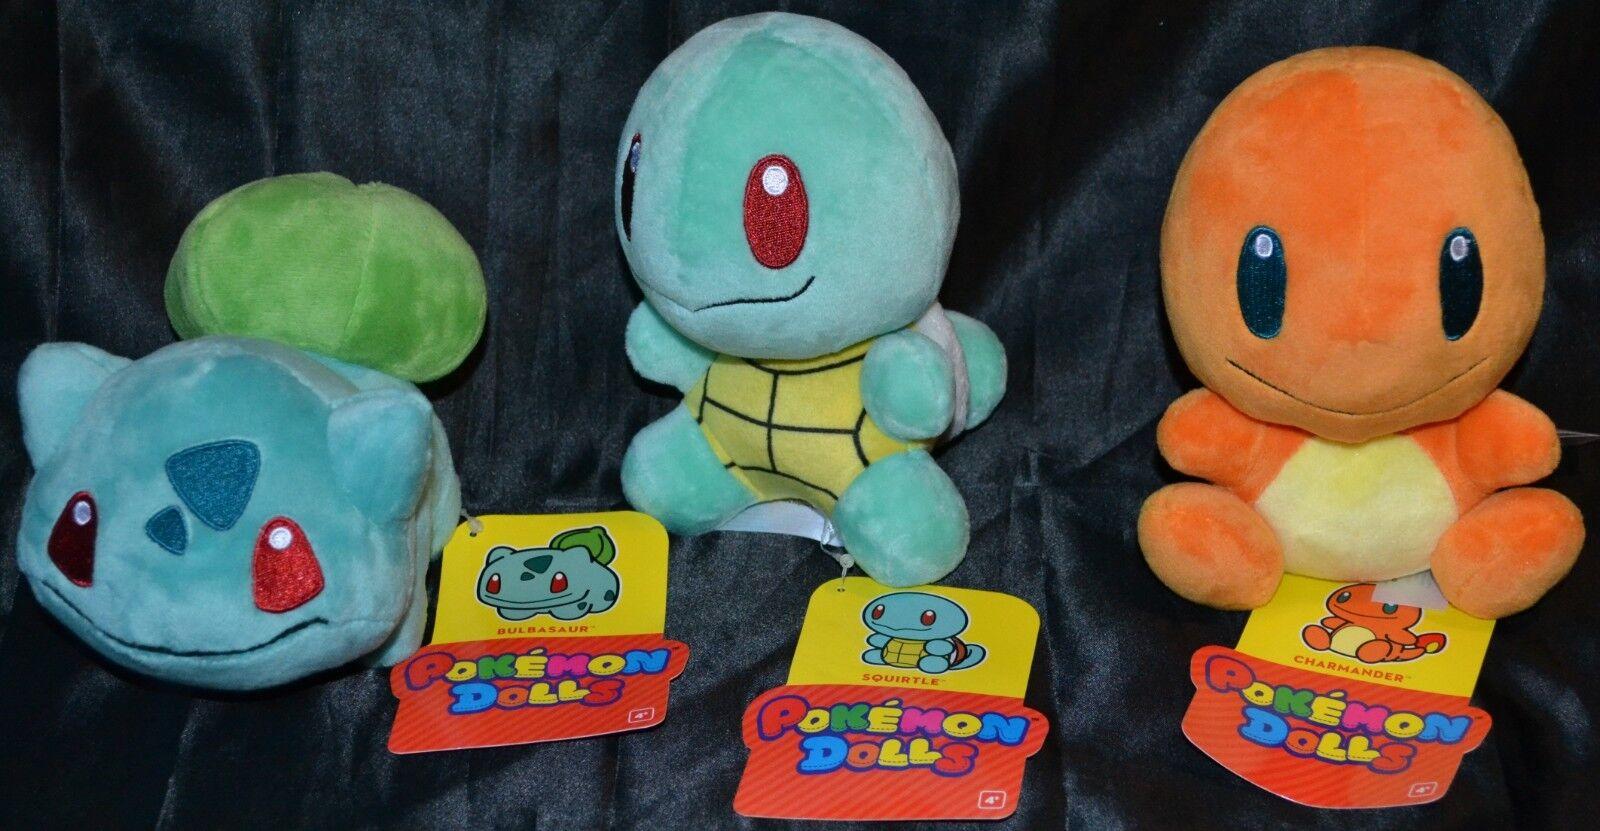 Charmander, Bulbasur & Squirtle Set of 3 Official Pokemon Center Plush Dolls